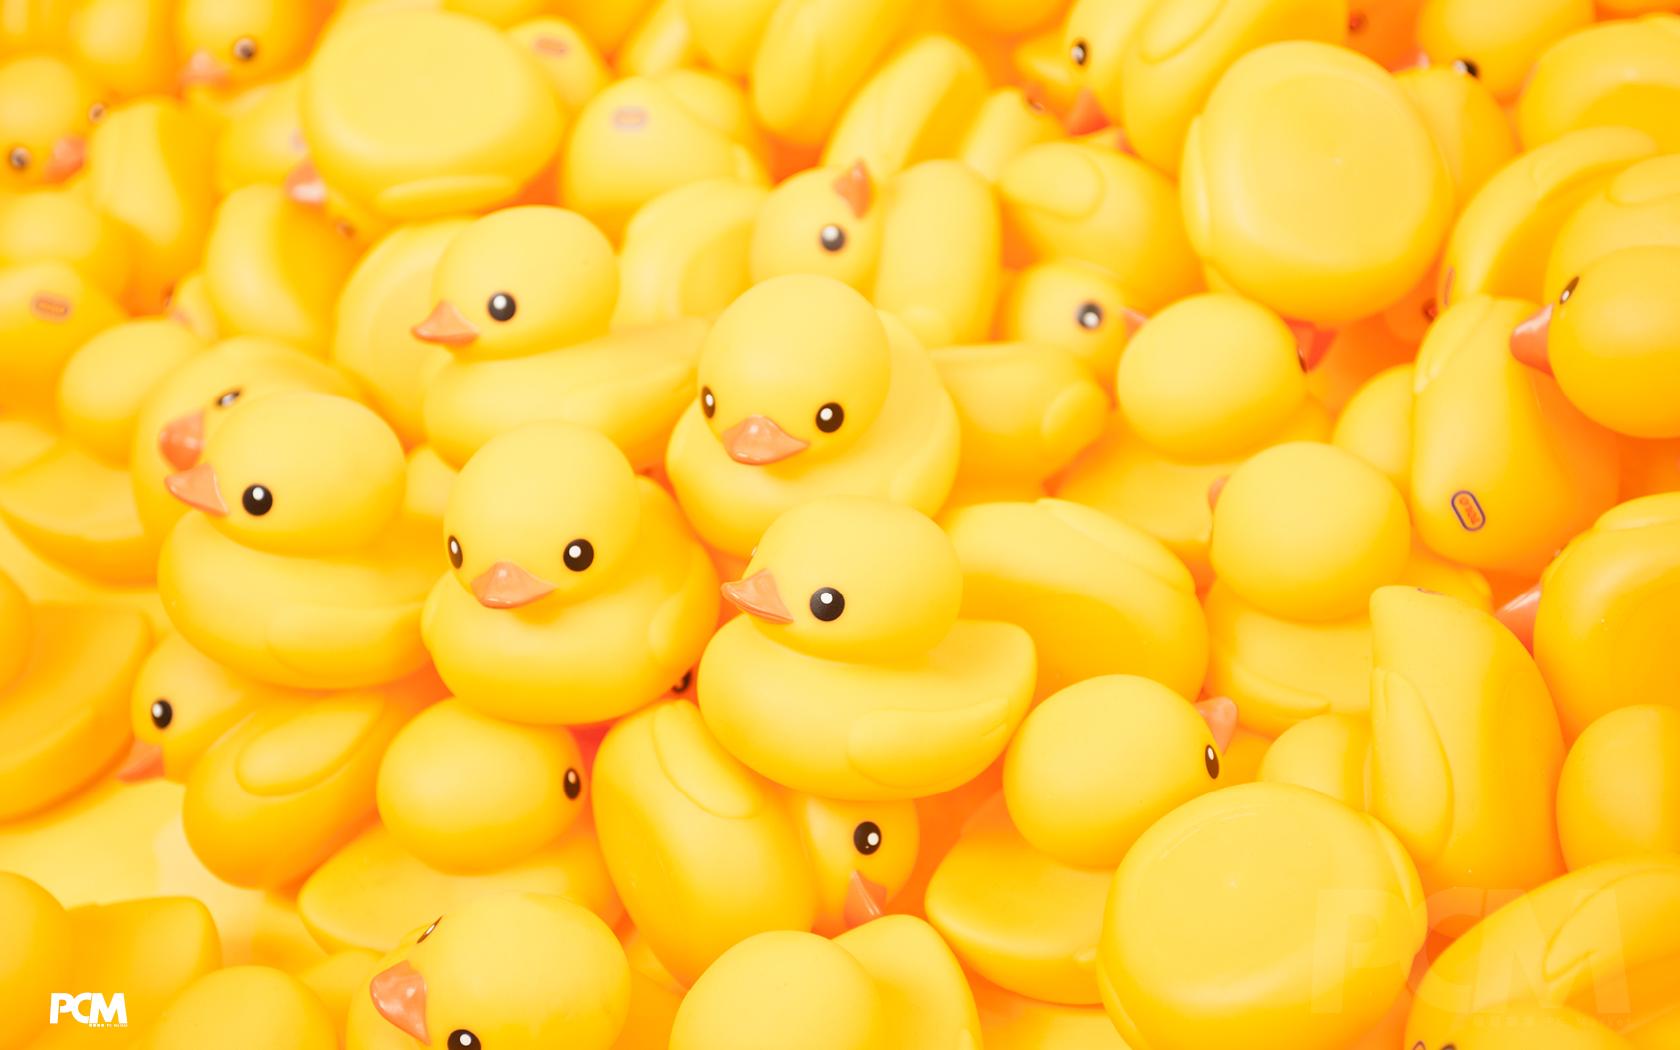 48] Rubber Duck Wallpaper on WallpaperSafari 1680x1050